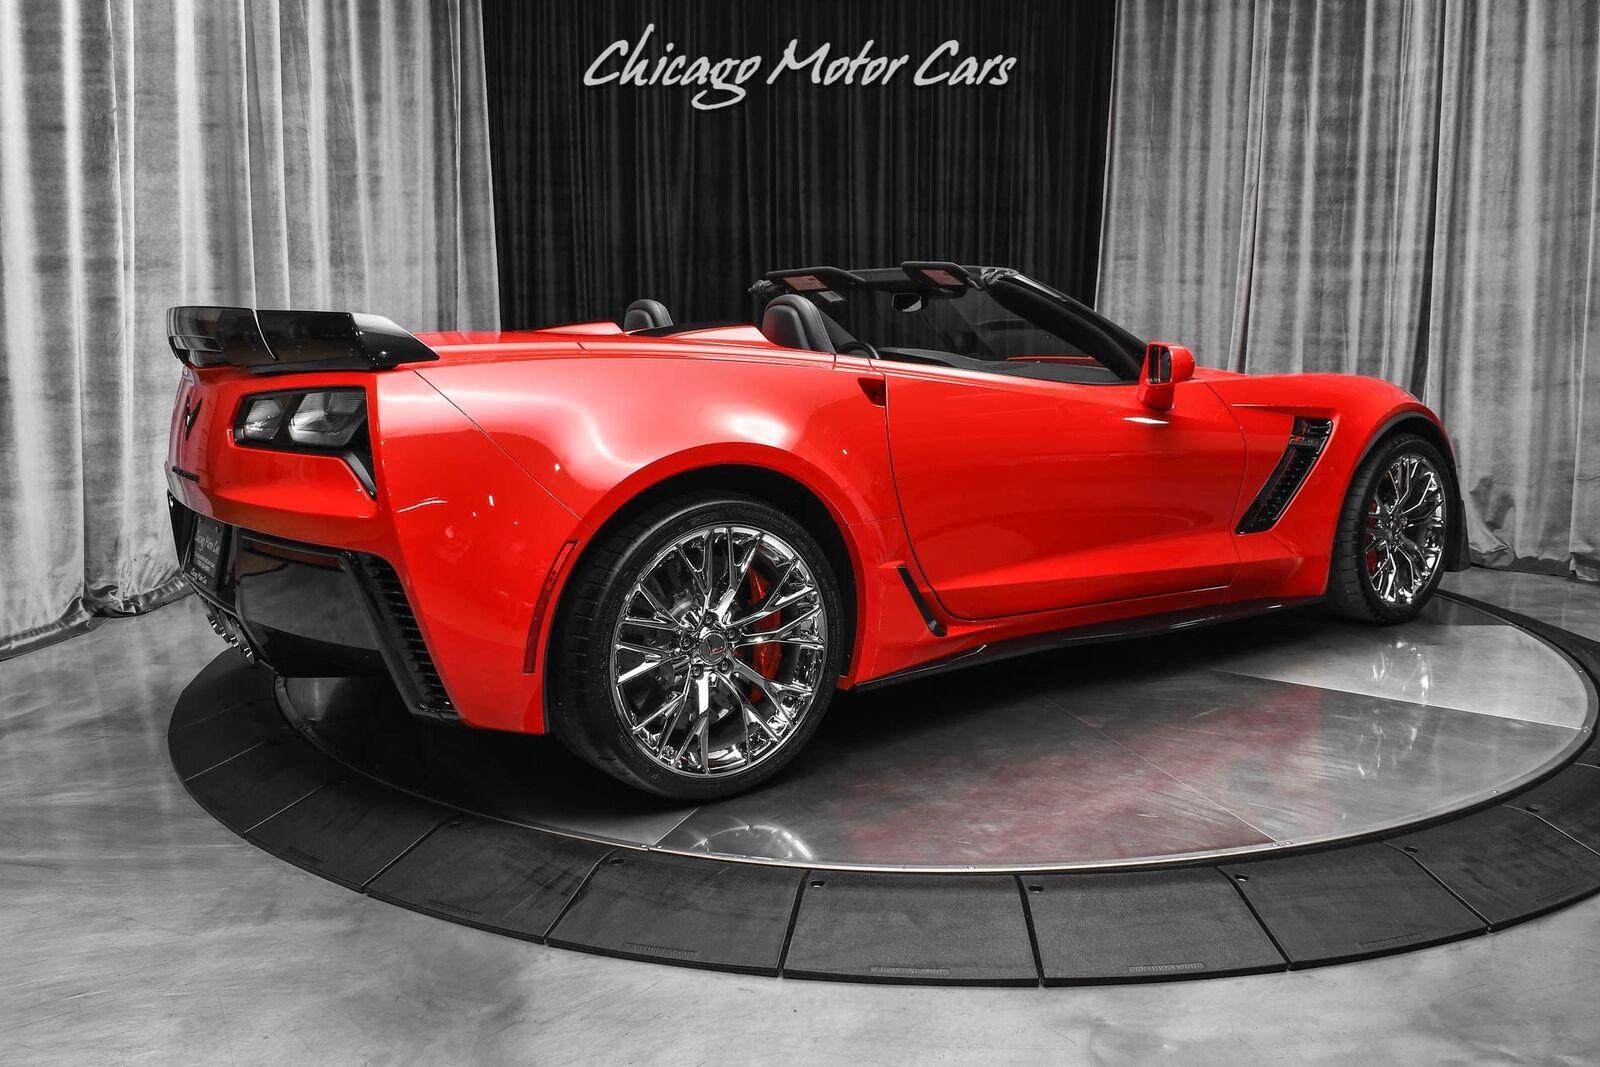 2015 Red Chevrolet Corvette Z06 2LZ | C7 Corvette Photo 5